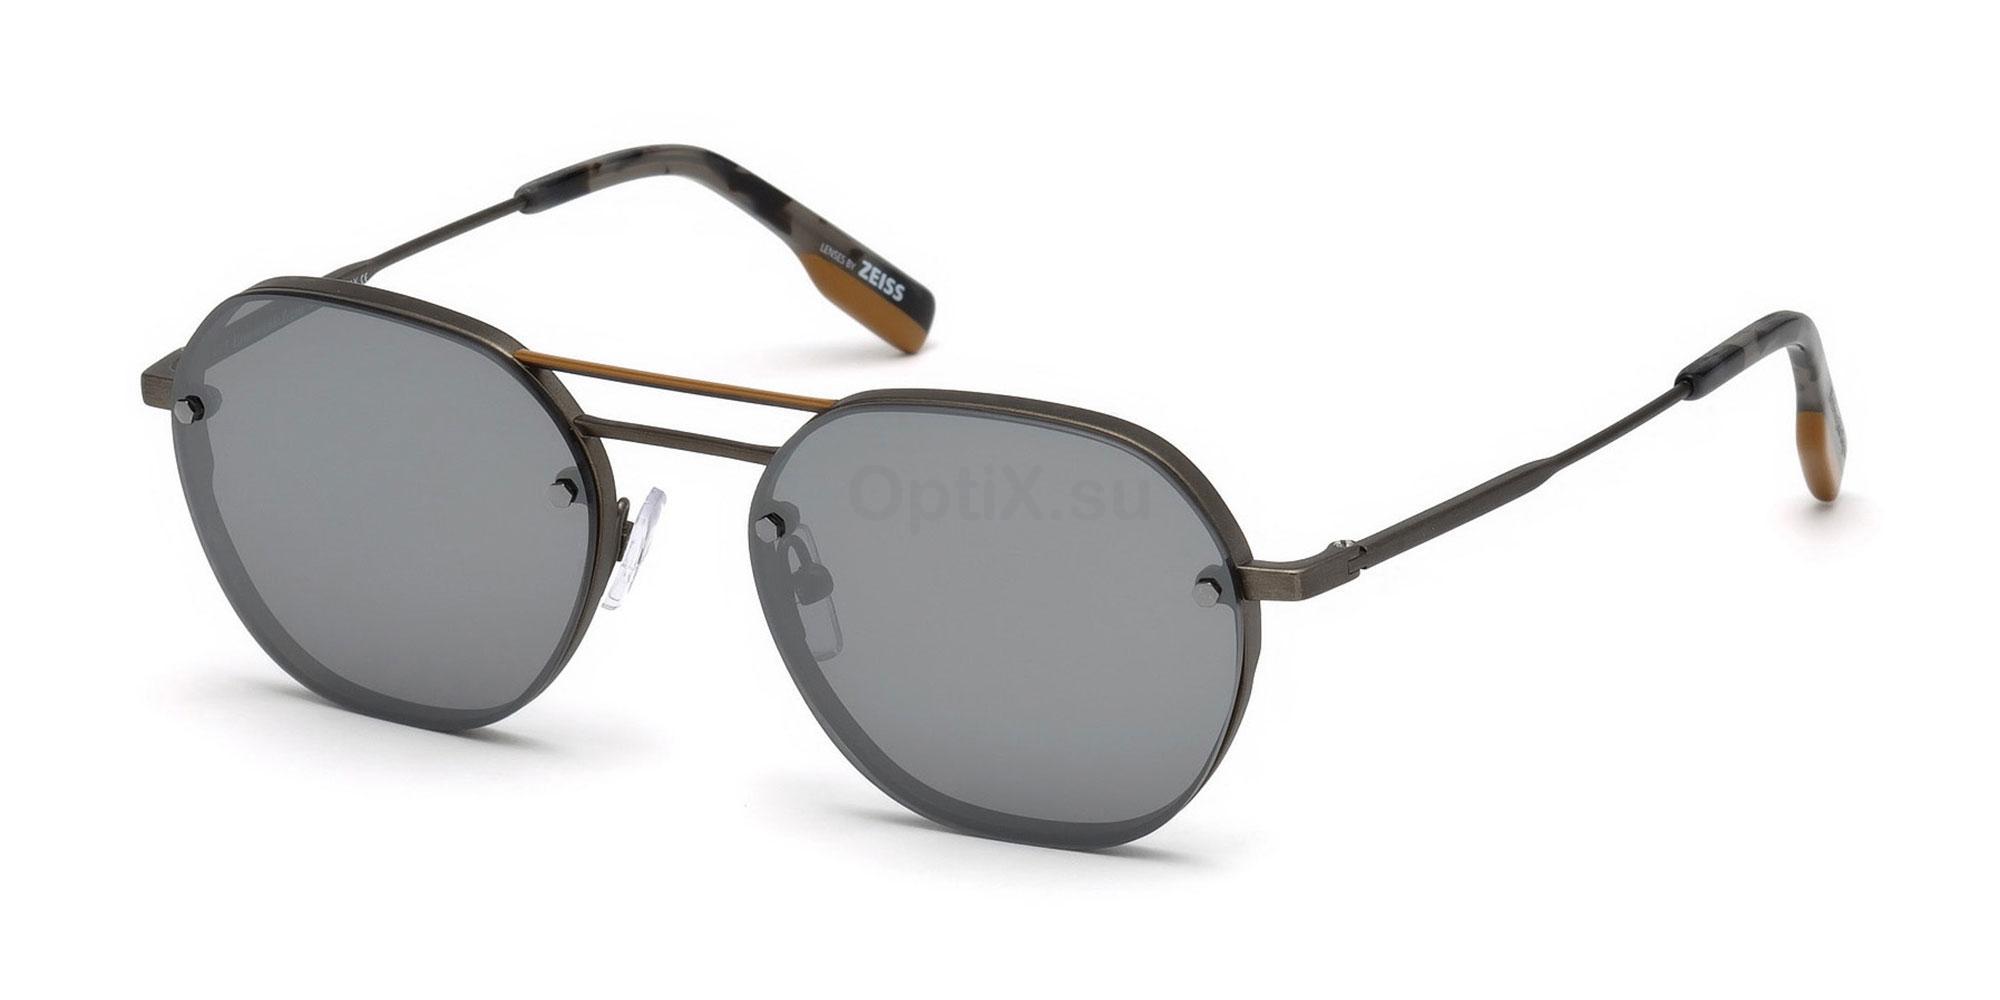 08C EZ0105 Sunglasses, Ermenegildo Zegna